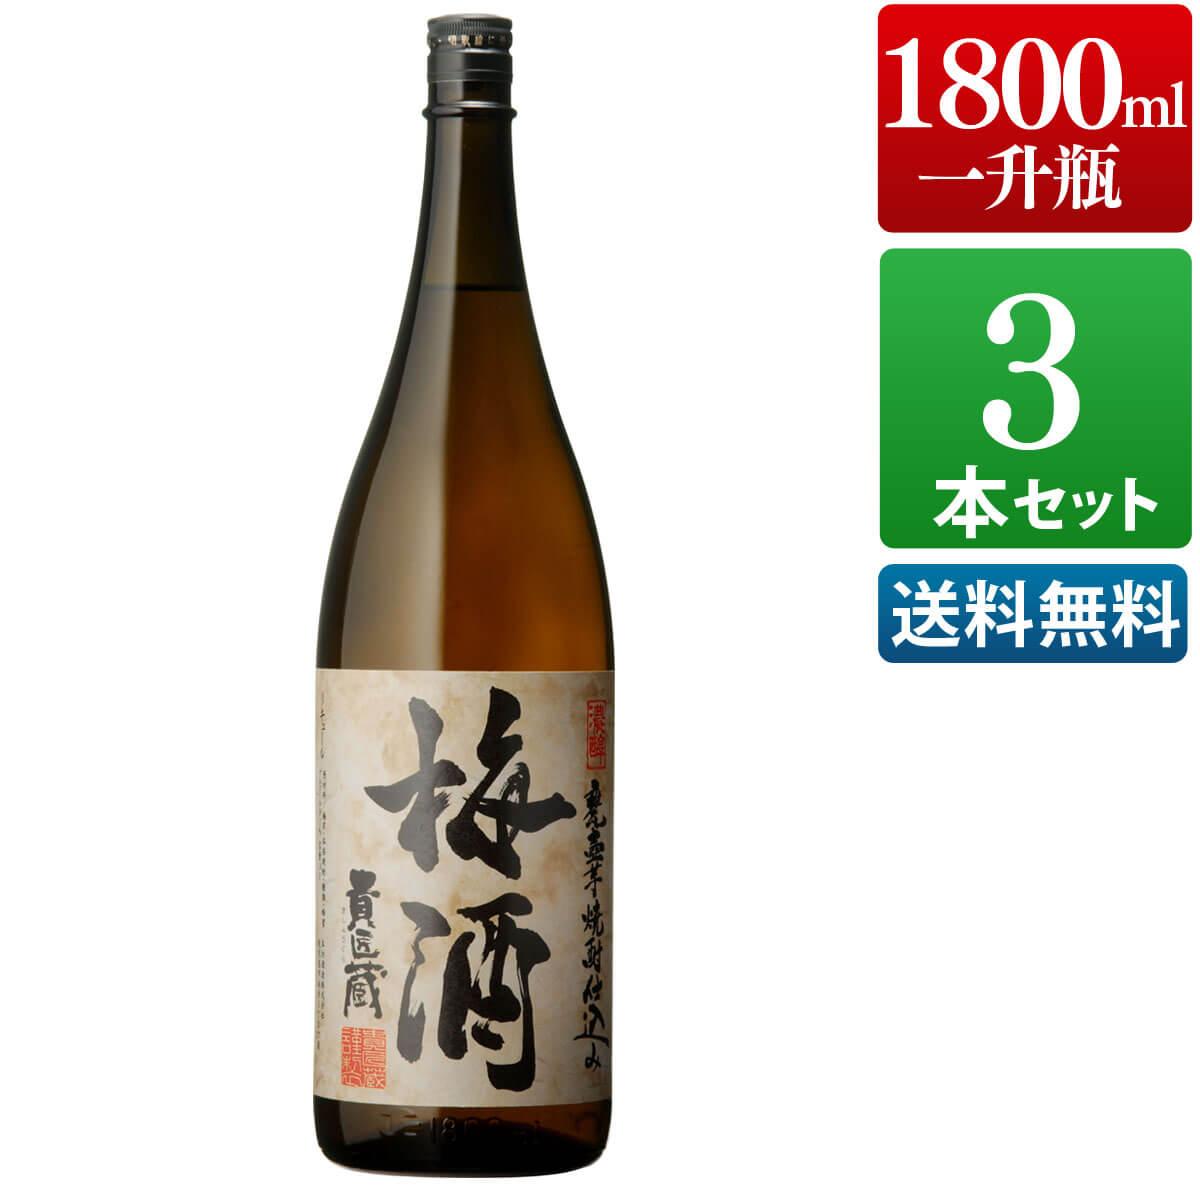 本格梅酒 3本セット 貴匠蔵梅酒 17度 1800ml [ 本坊酒造 焼酎仕込み 梅酒 / 送料無料 ]